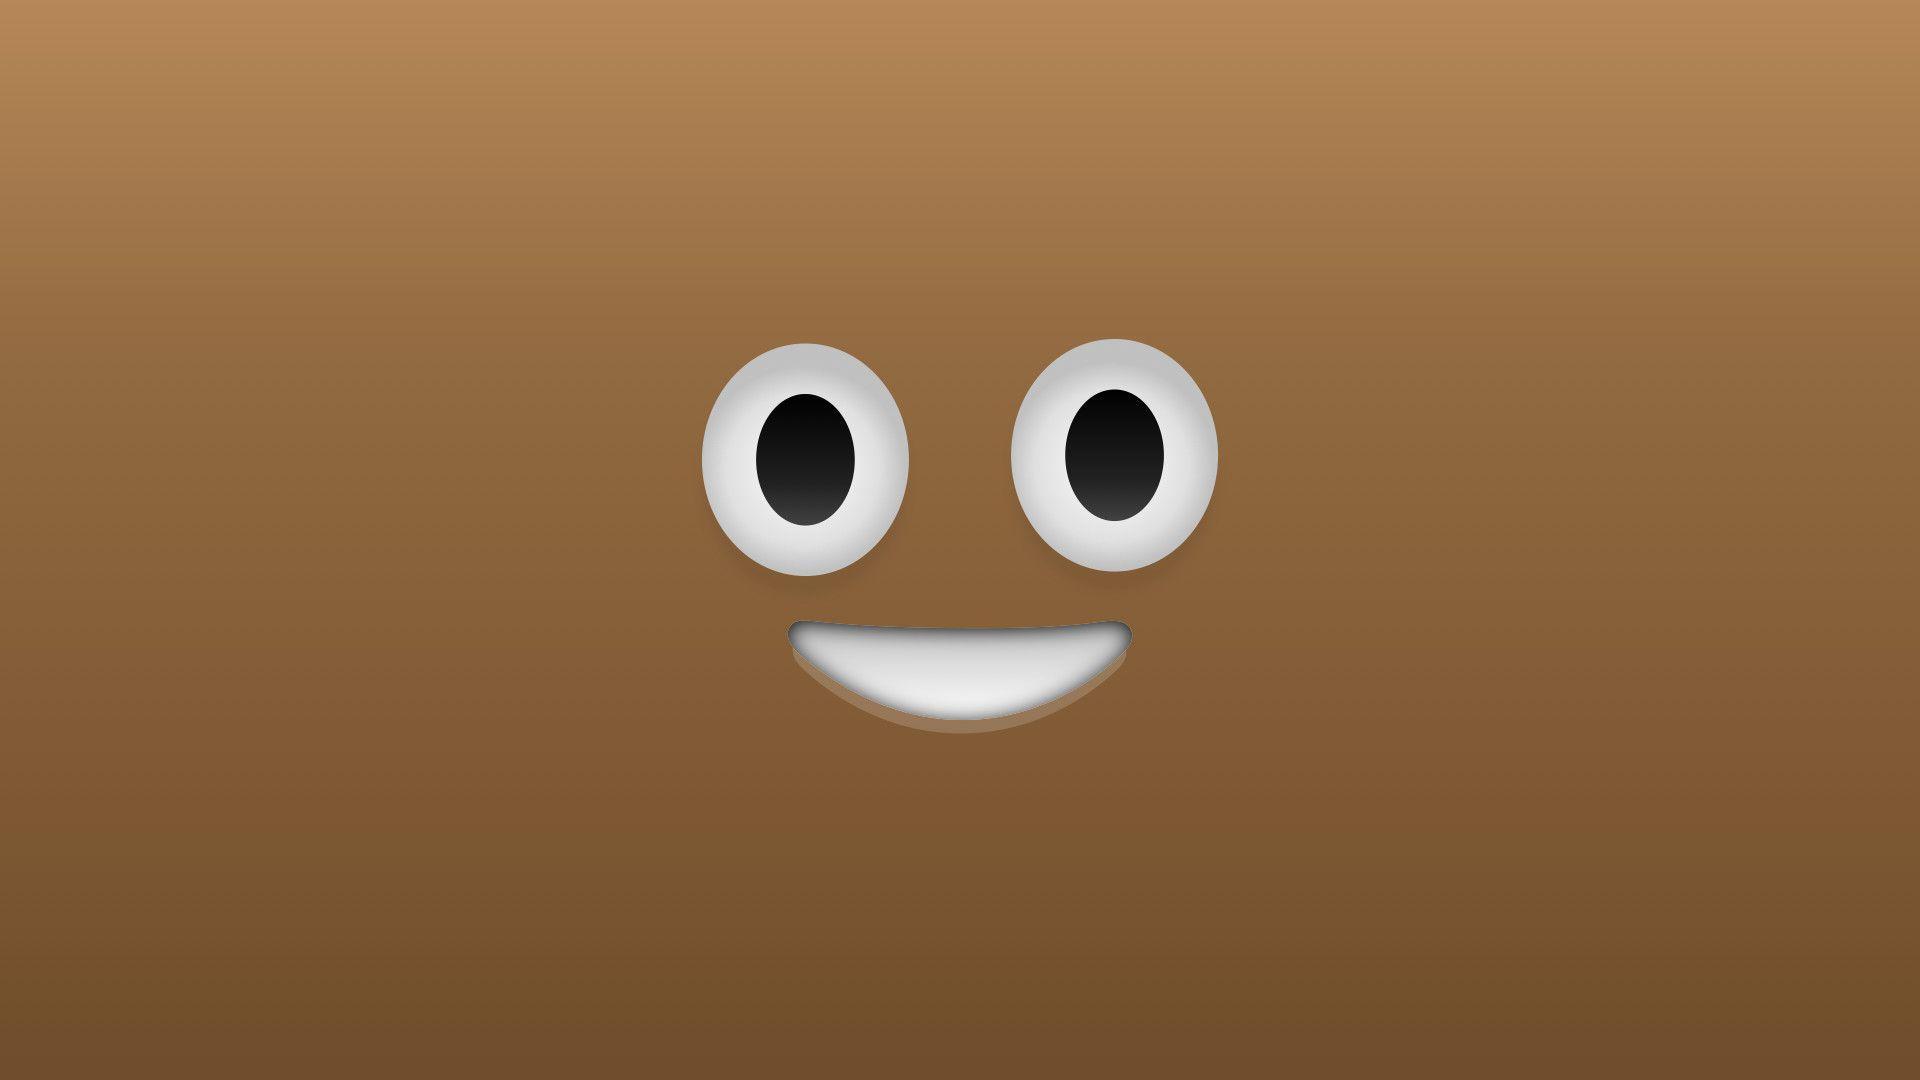 Poop Emoji Wallpapers - Wallpaper Cave